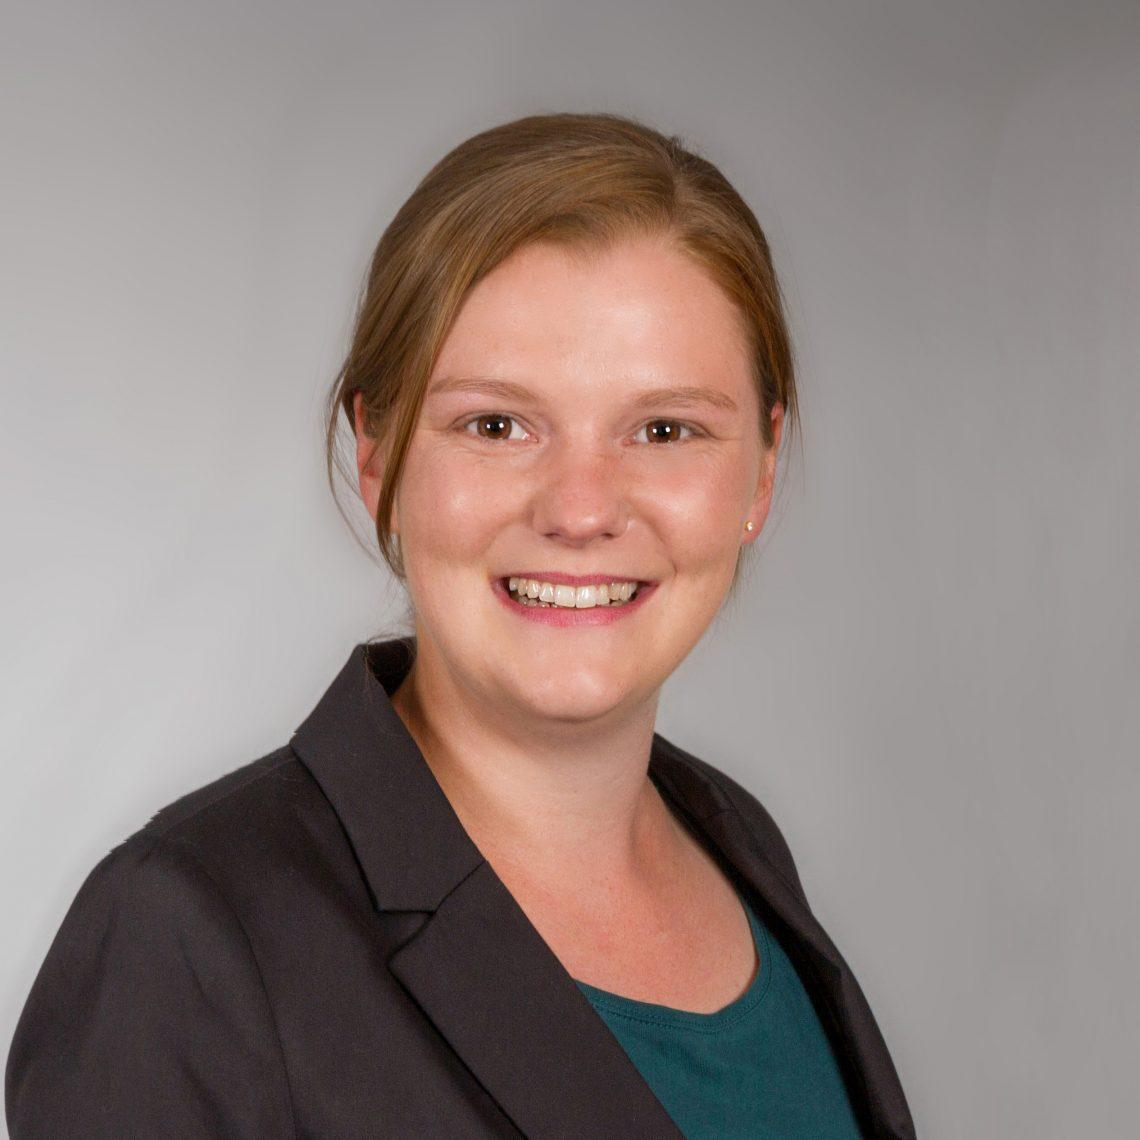 Anna Uhl